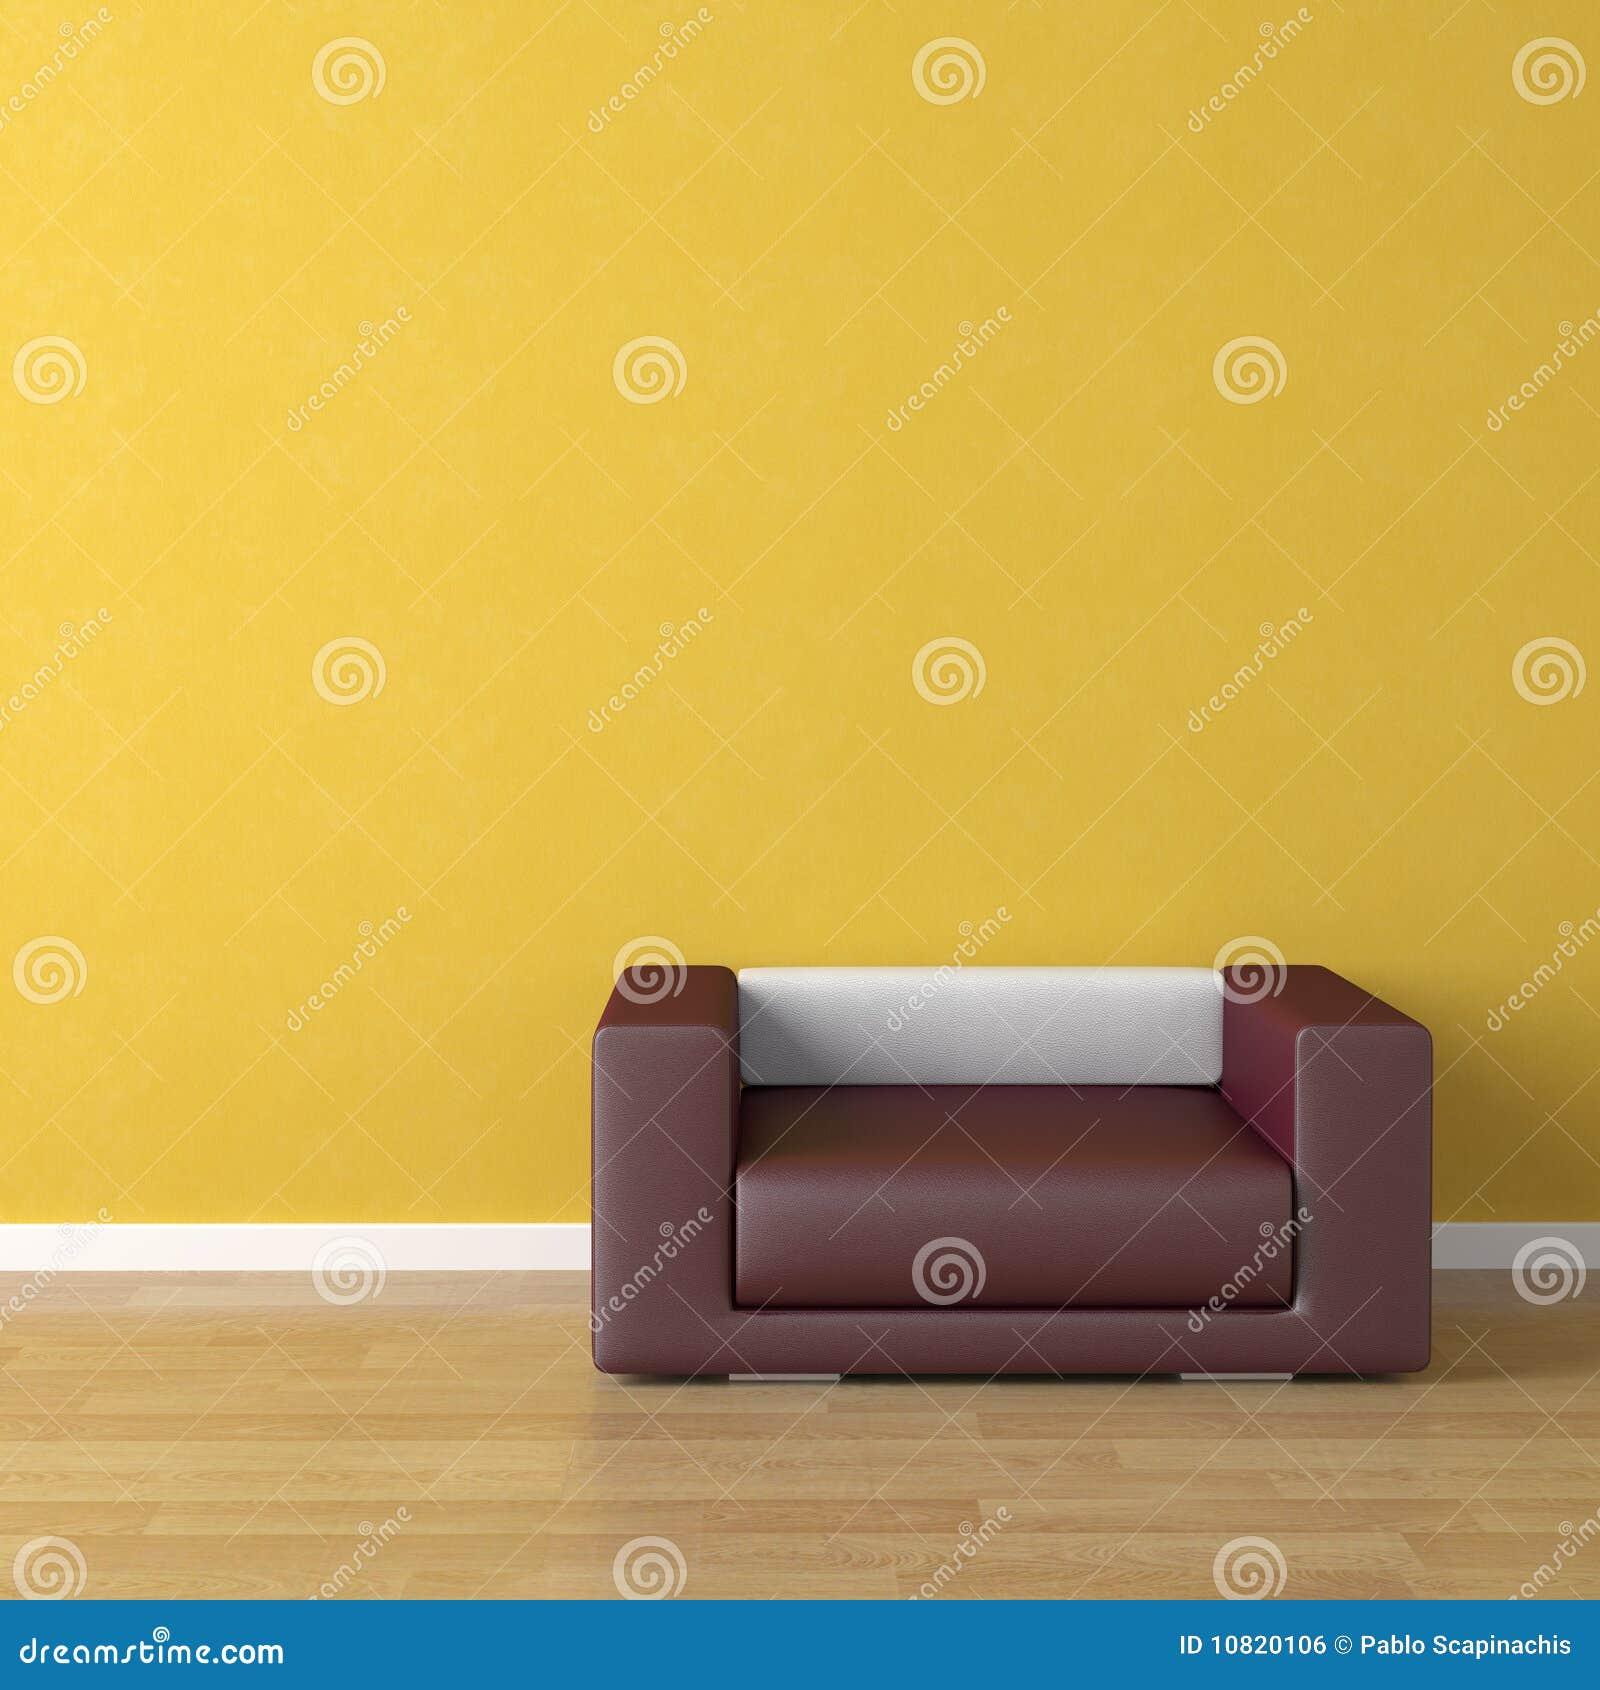 Interior design violet couch on